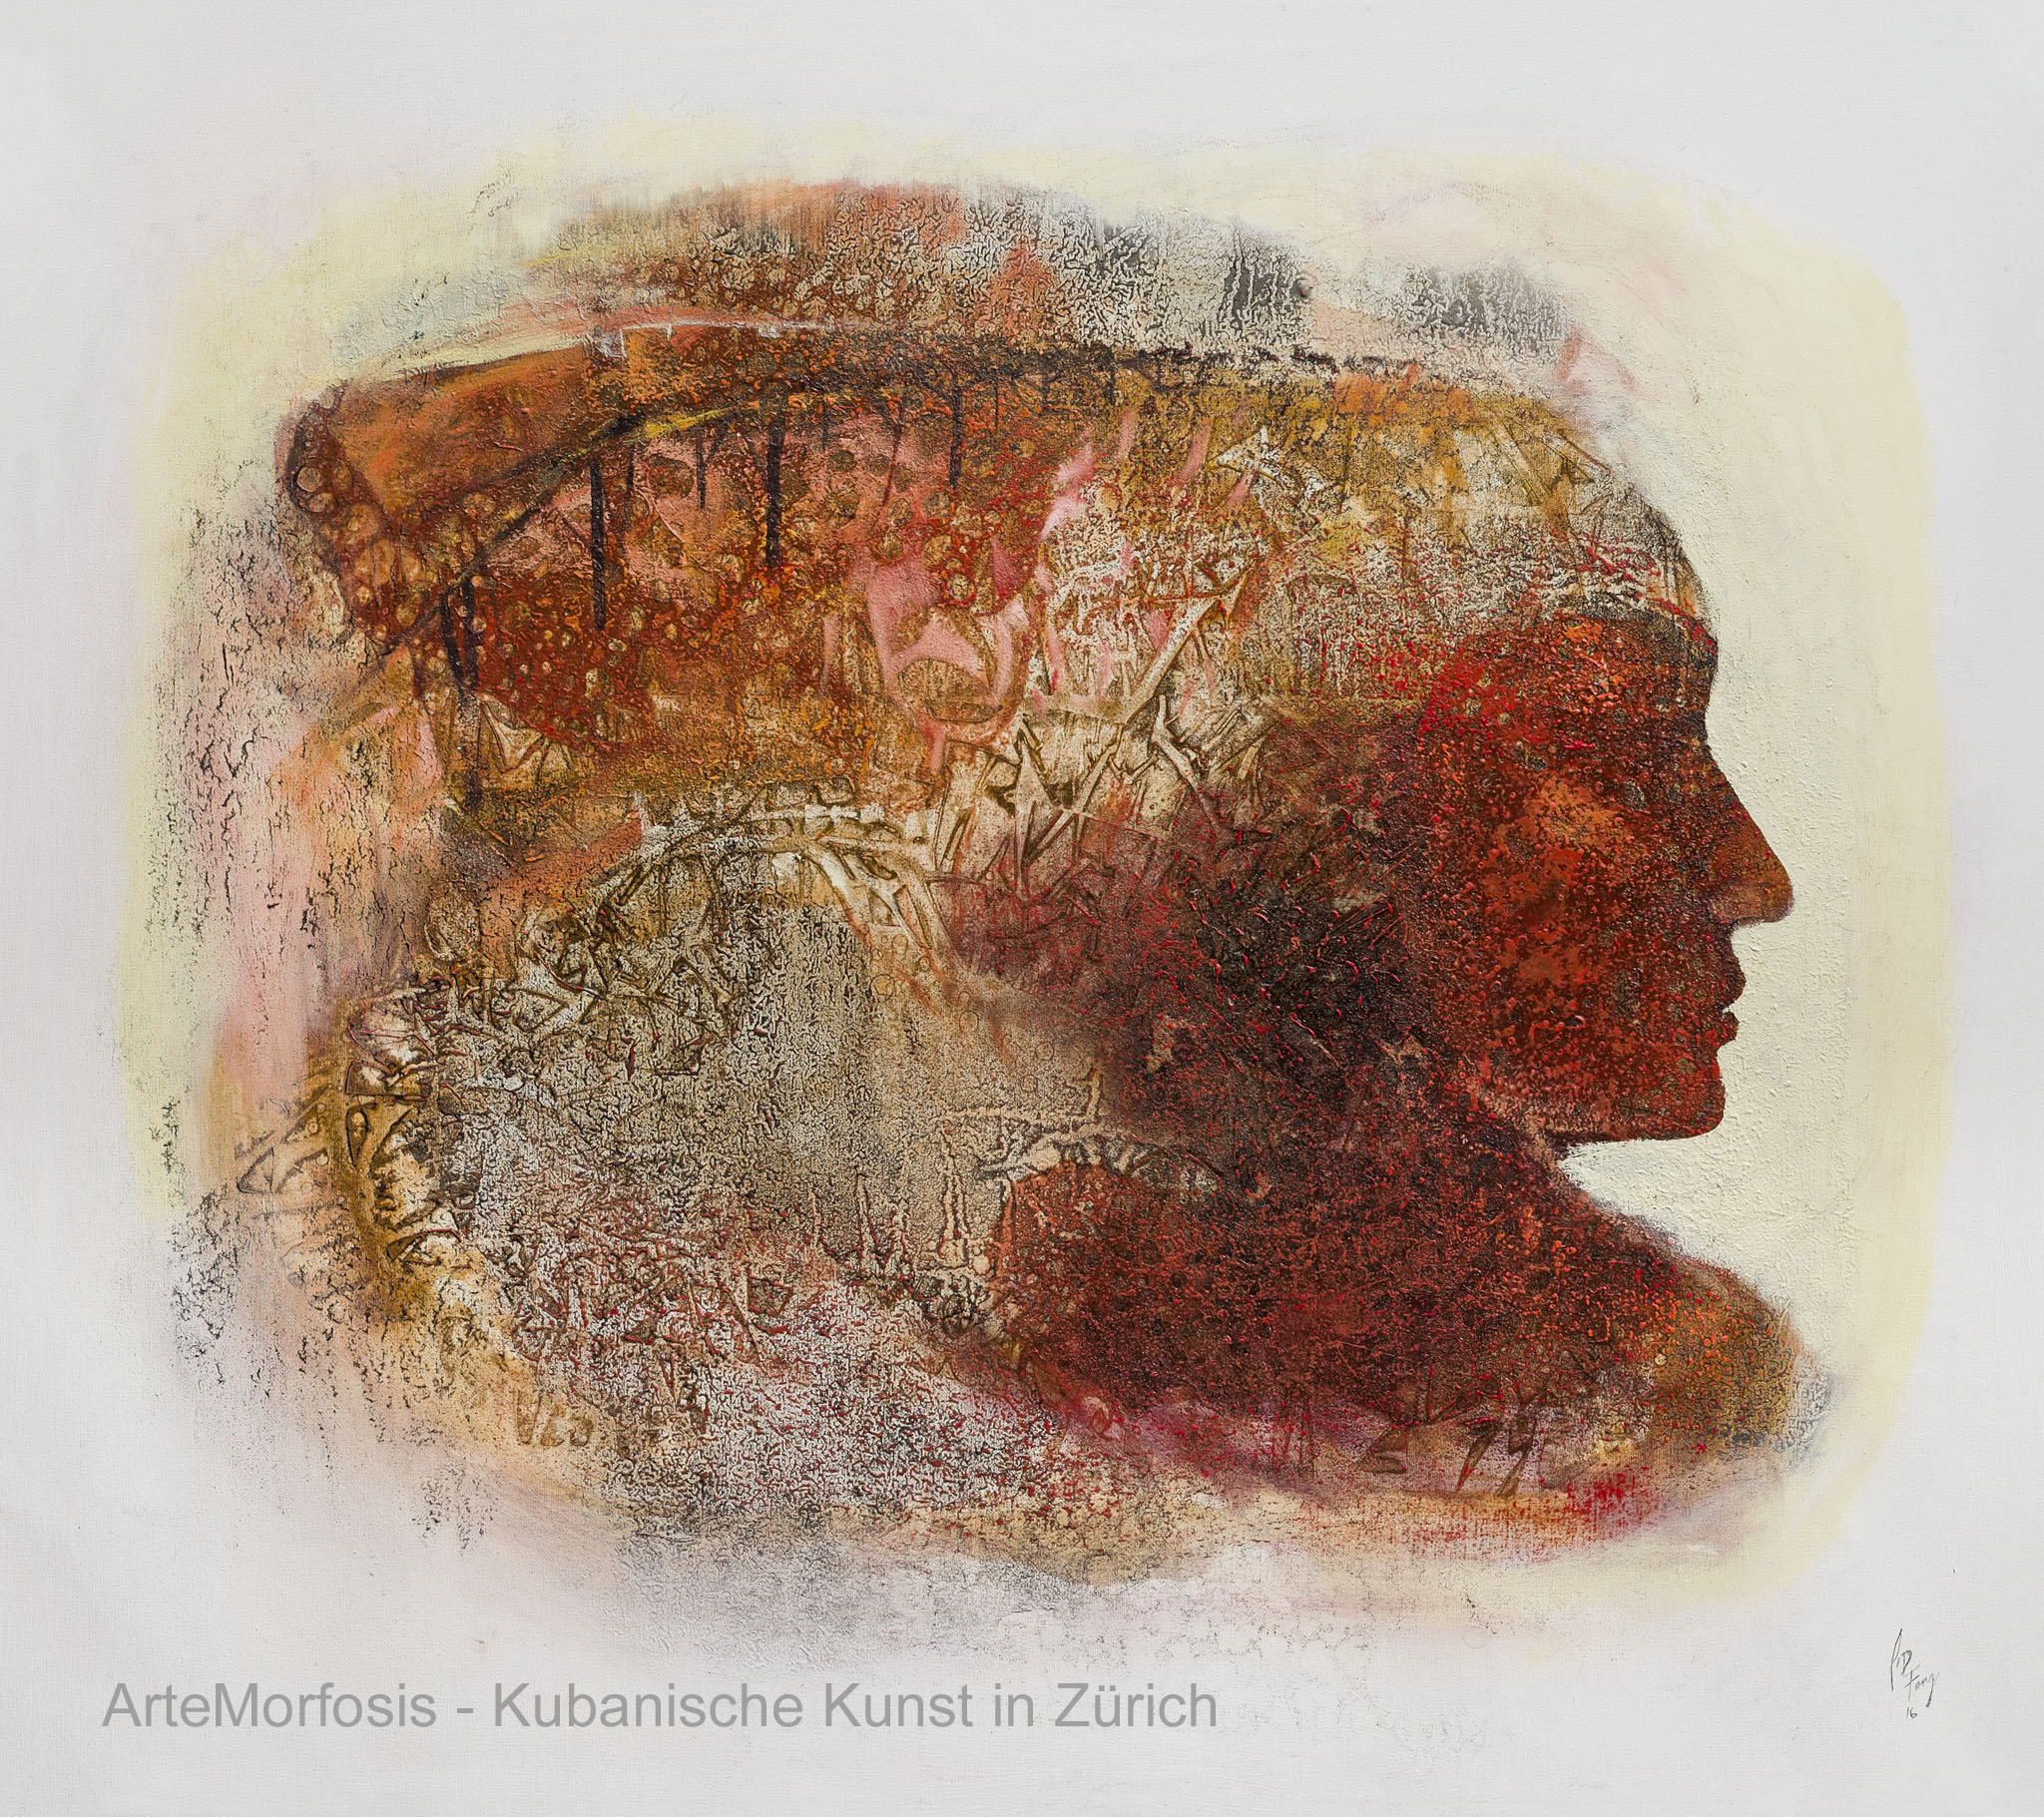 Li D Fong: Memorias / Memories - Mixed on Canvas - 2016 - 95 x 107 cm